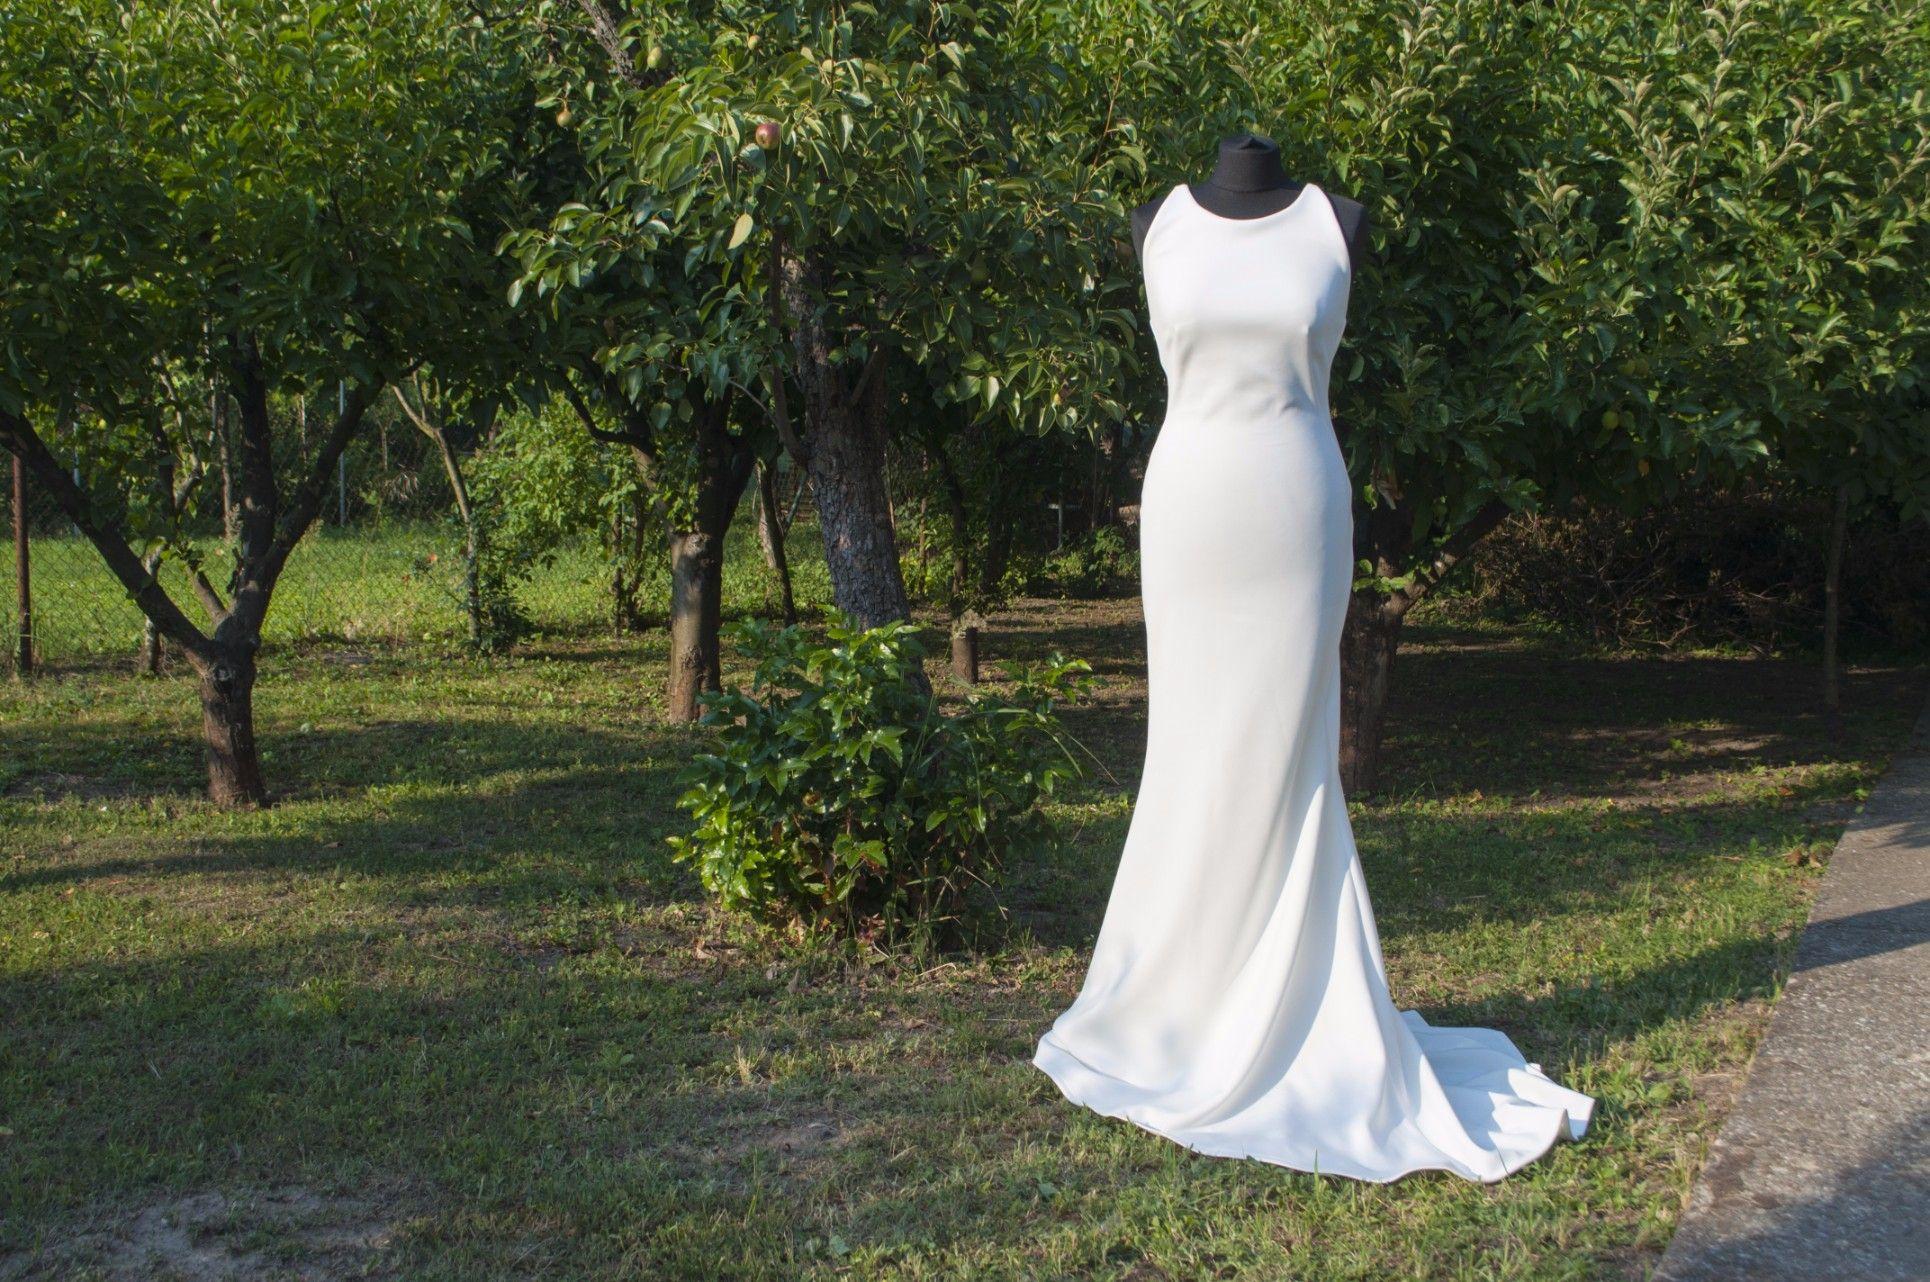 Handmade wedding dress  Affordable handmade wedding dress made in Europe by Glamsy